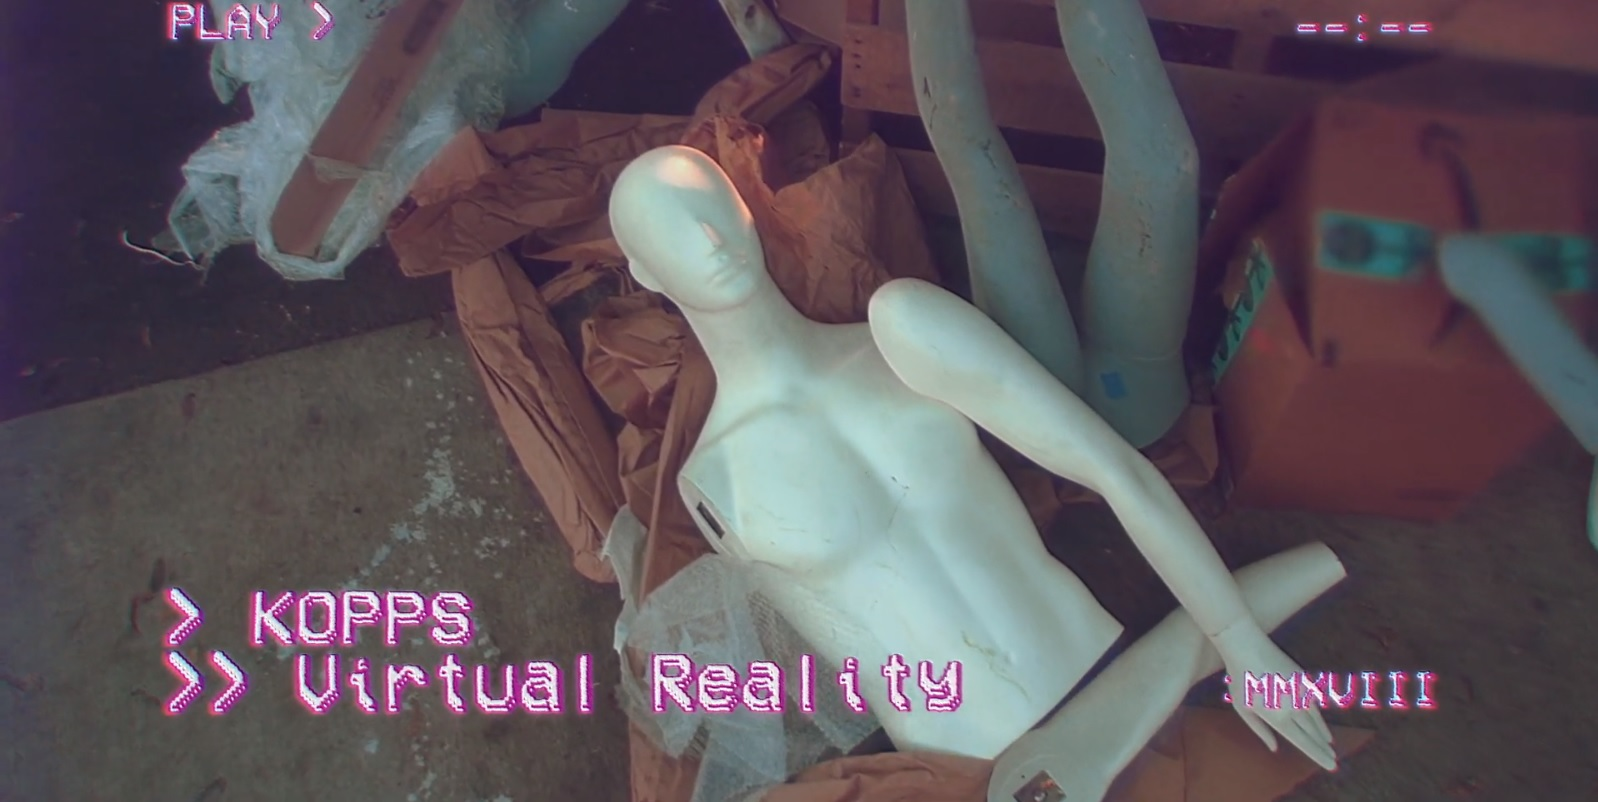 KOPPS - Virtual Reality 1